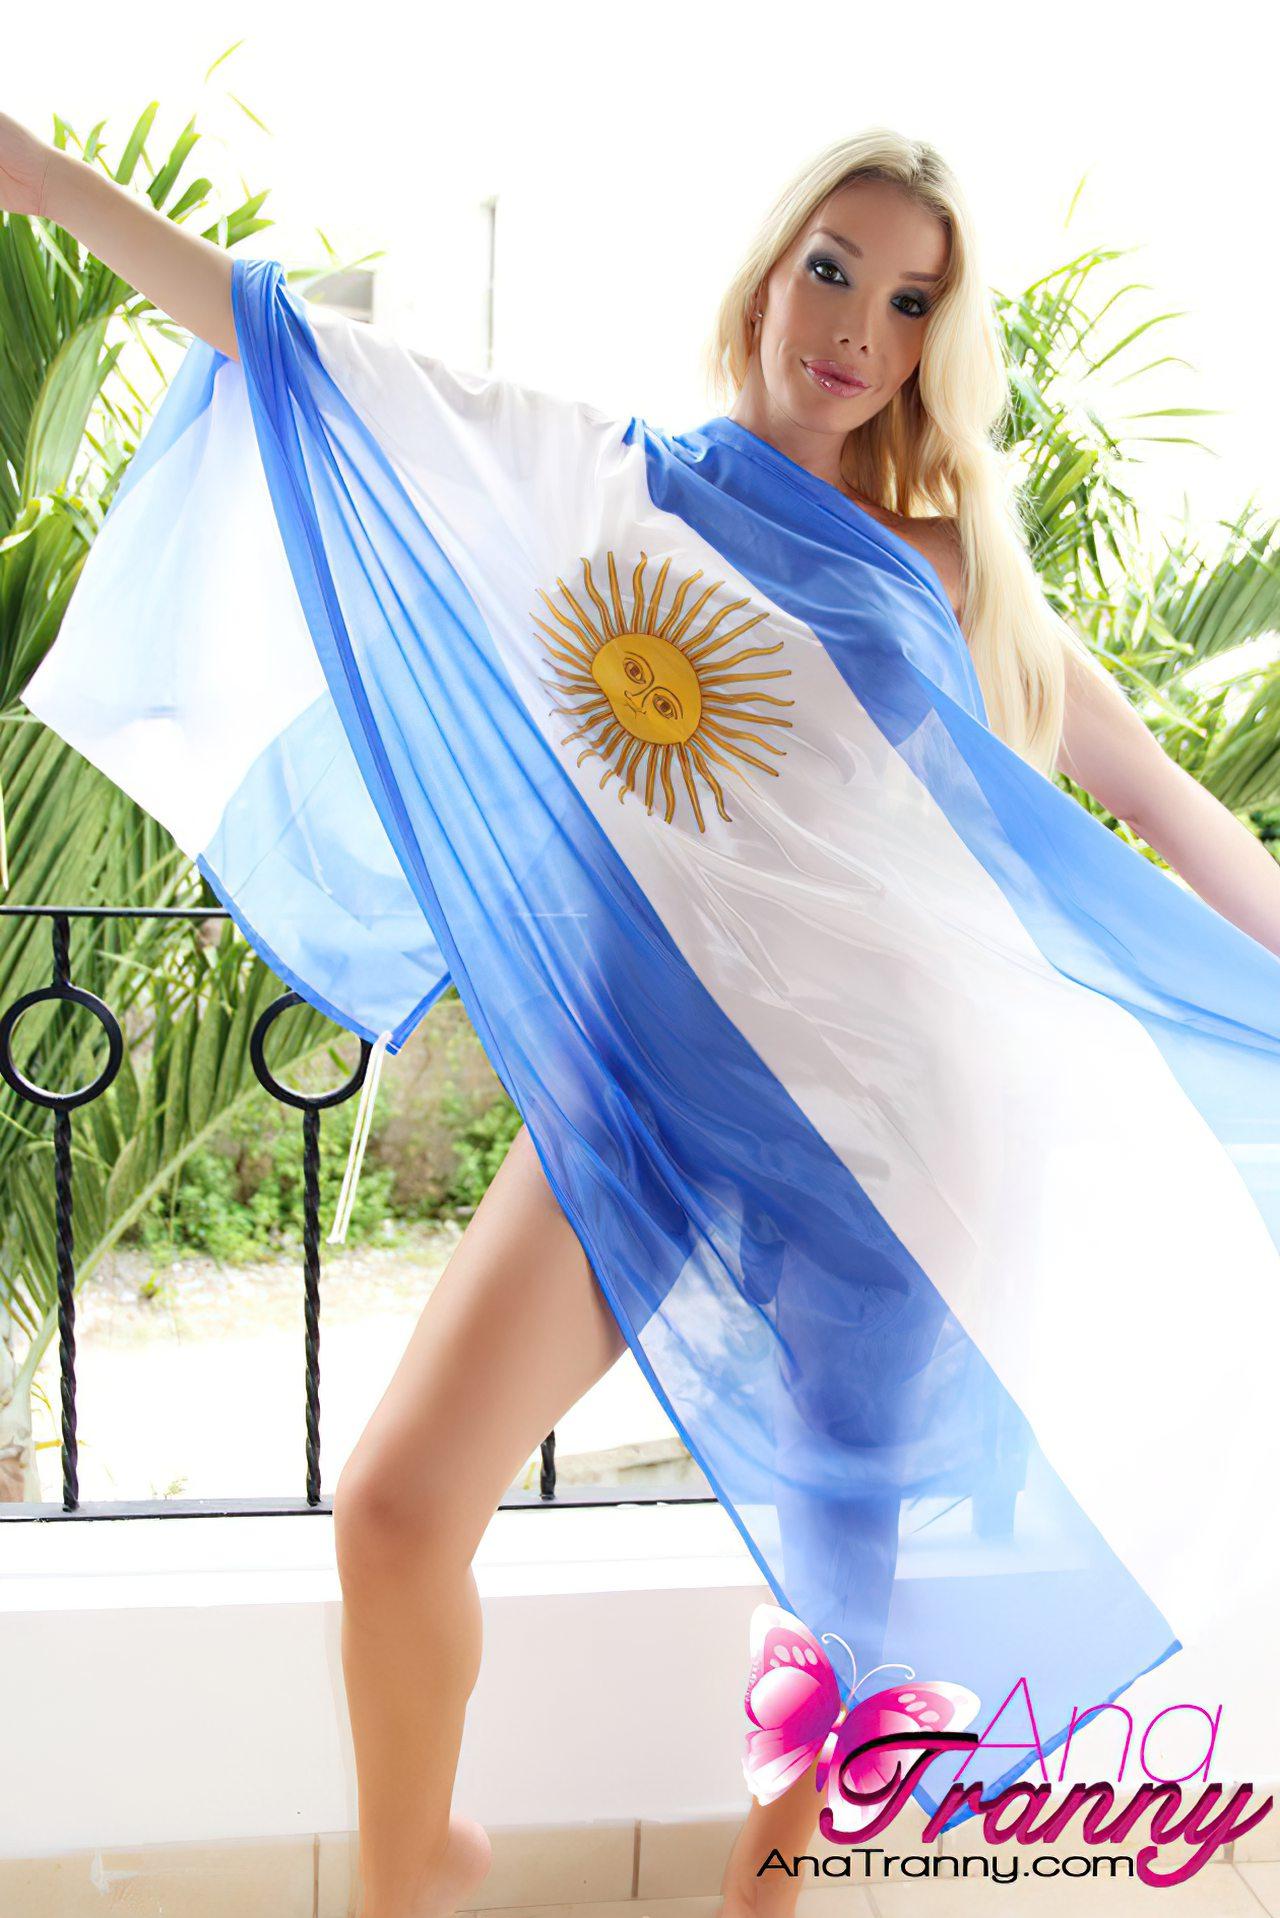 Travesti Argentina (4)